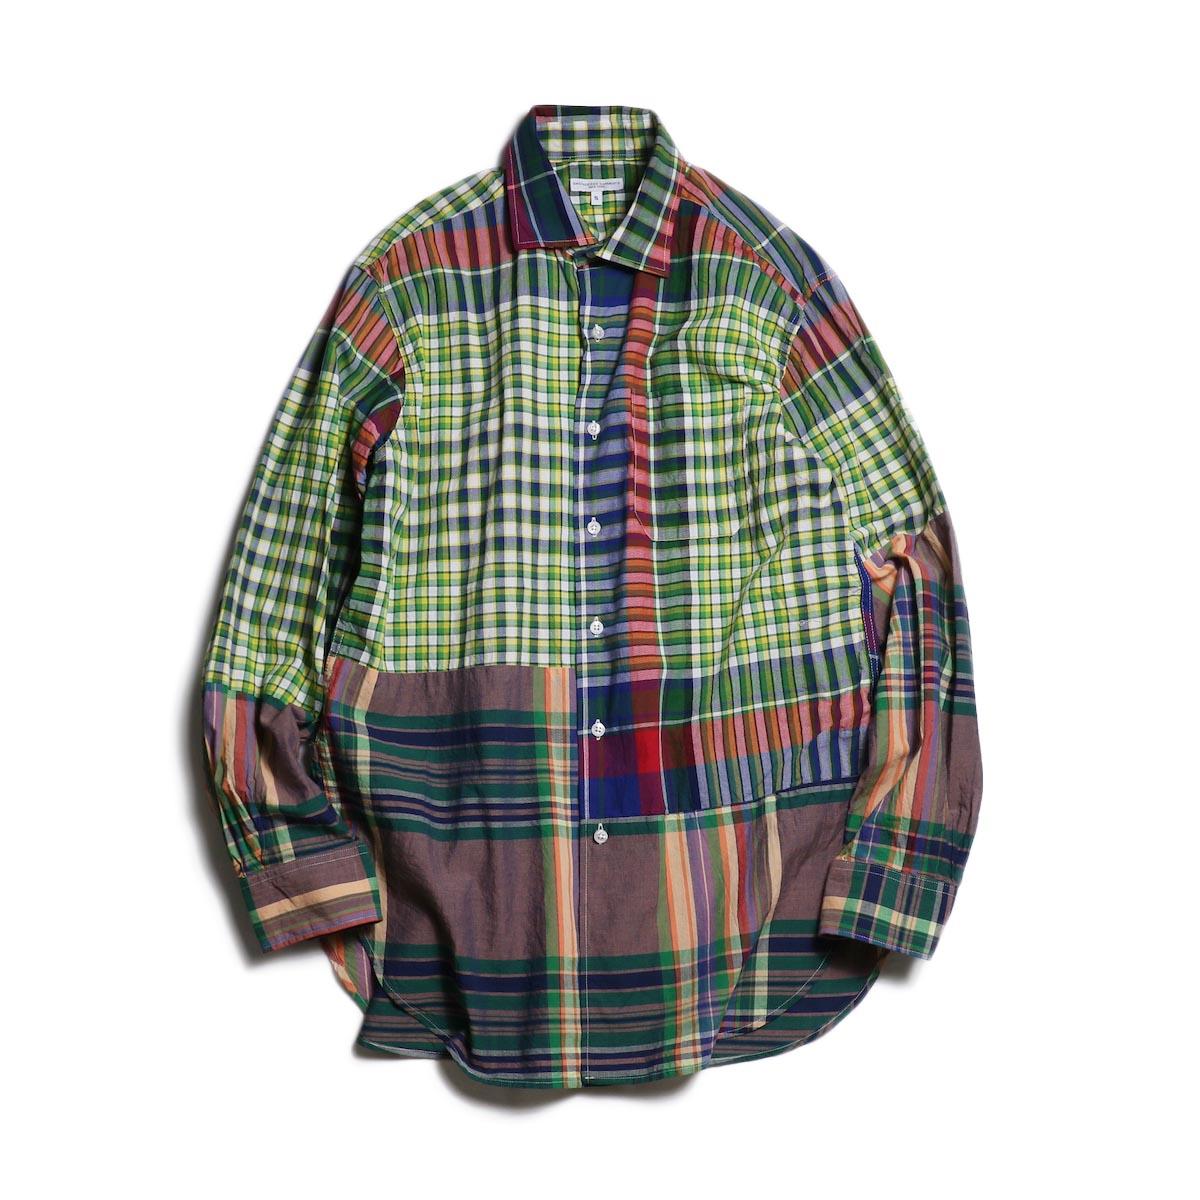 Engineered Garments / Spread Collar Shirt -Big Madras Plaid (Red/Blue/Green)